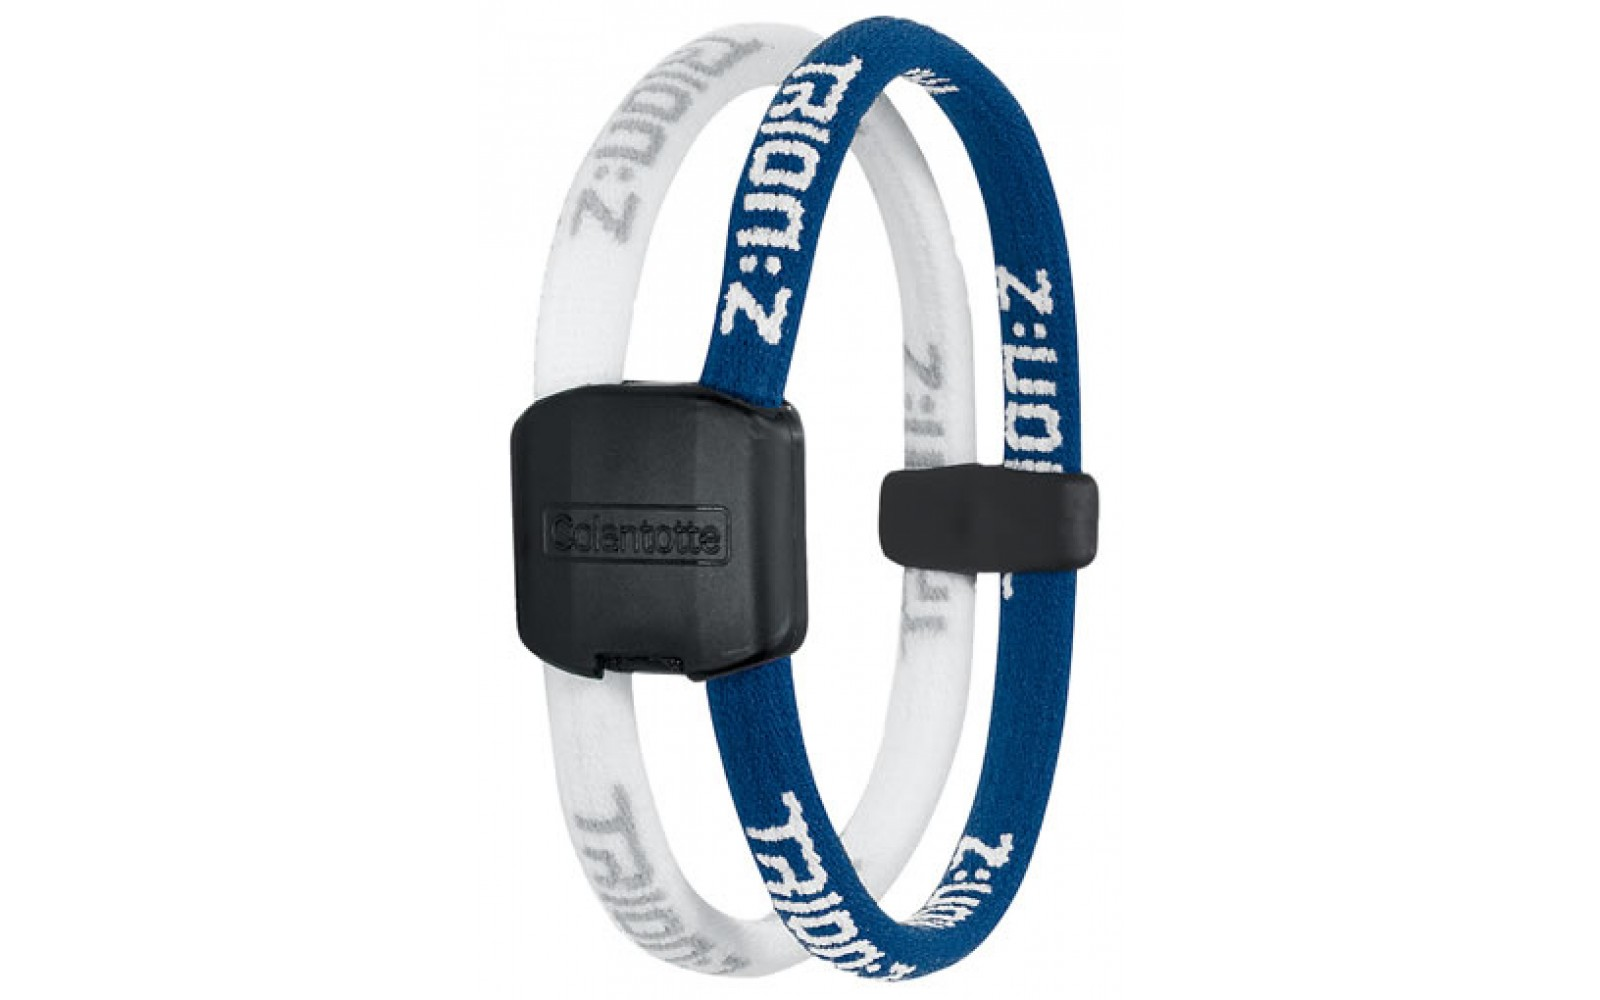 Trion:Z Magneet Armband, Kleur : Blauw/Wit, Maat : Large